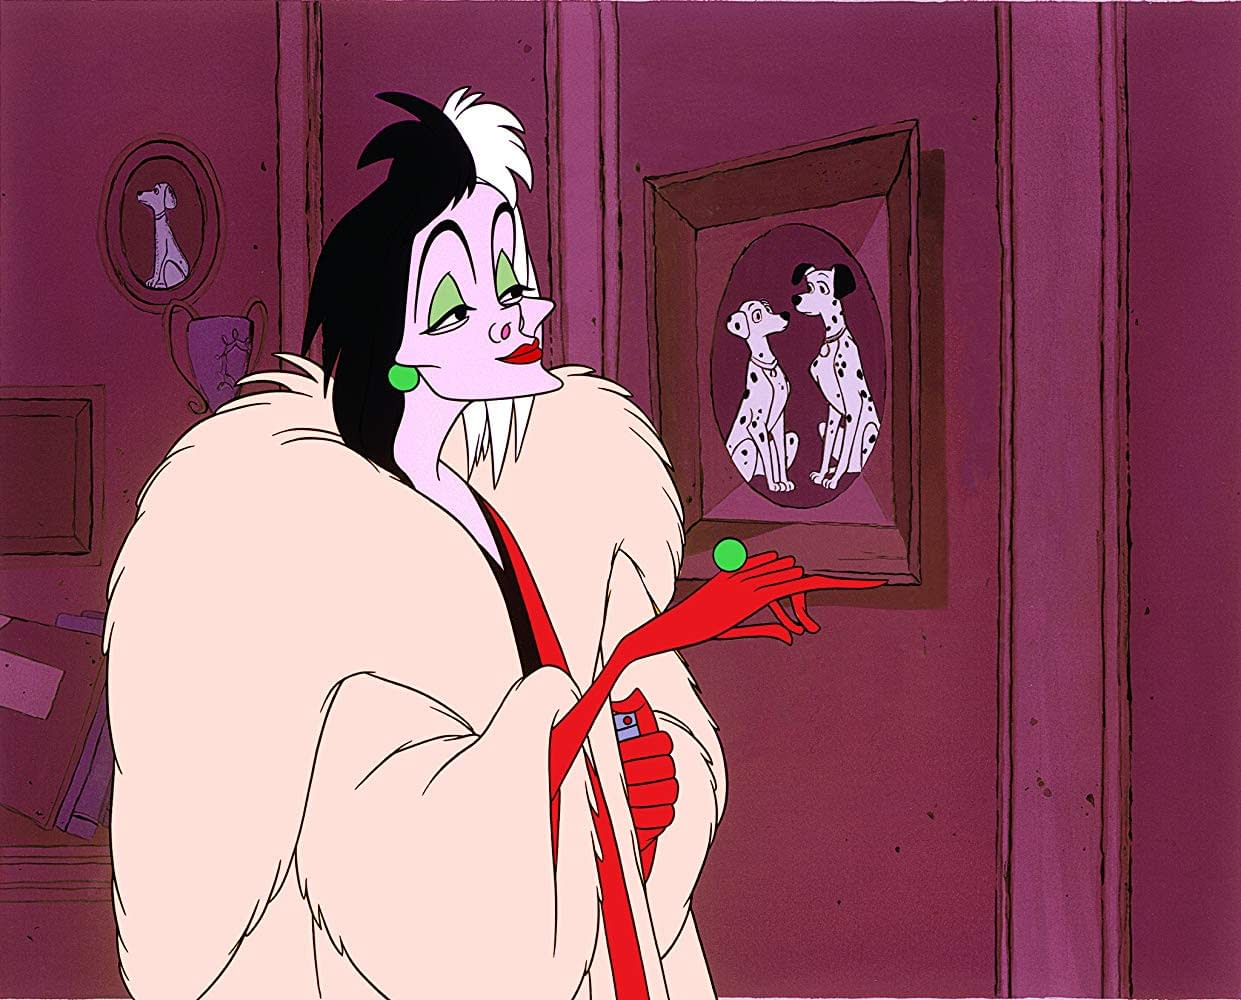 Director of 'I, Tonya' Craig Gillespie in Talks to Direct Cruella de Vil Prequel Movie